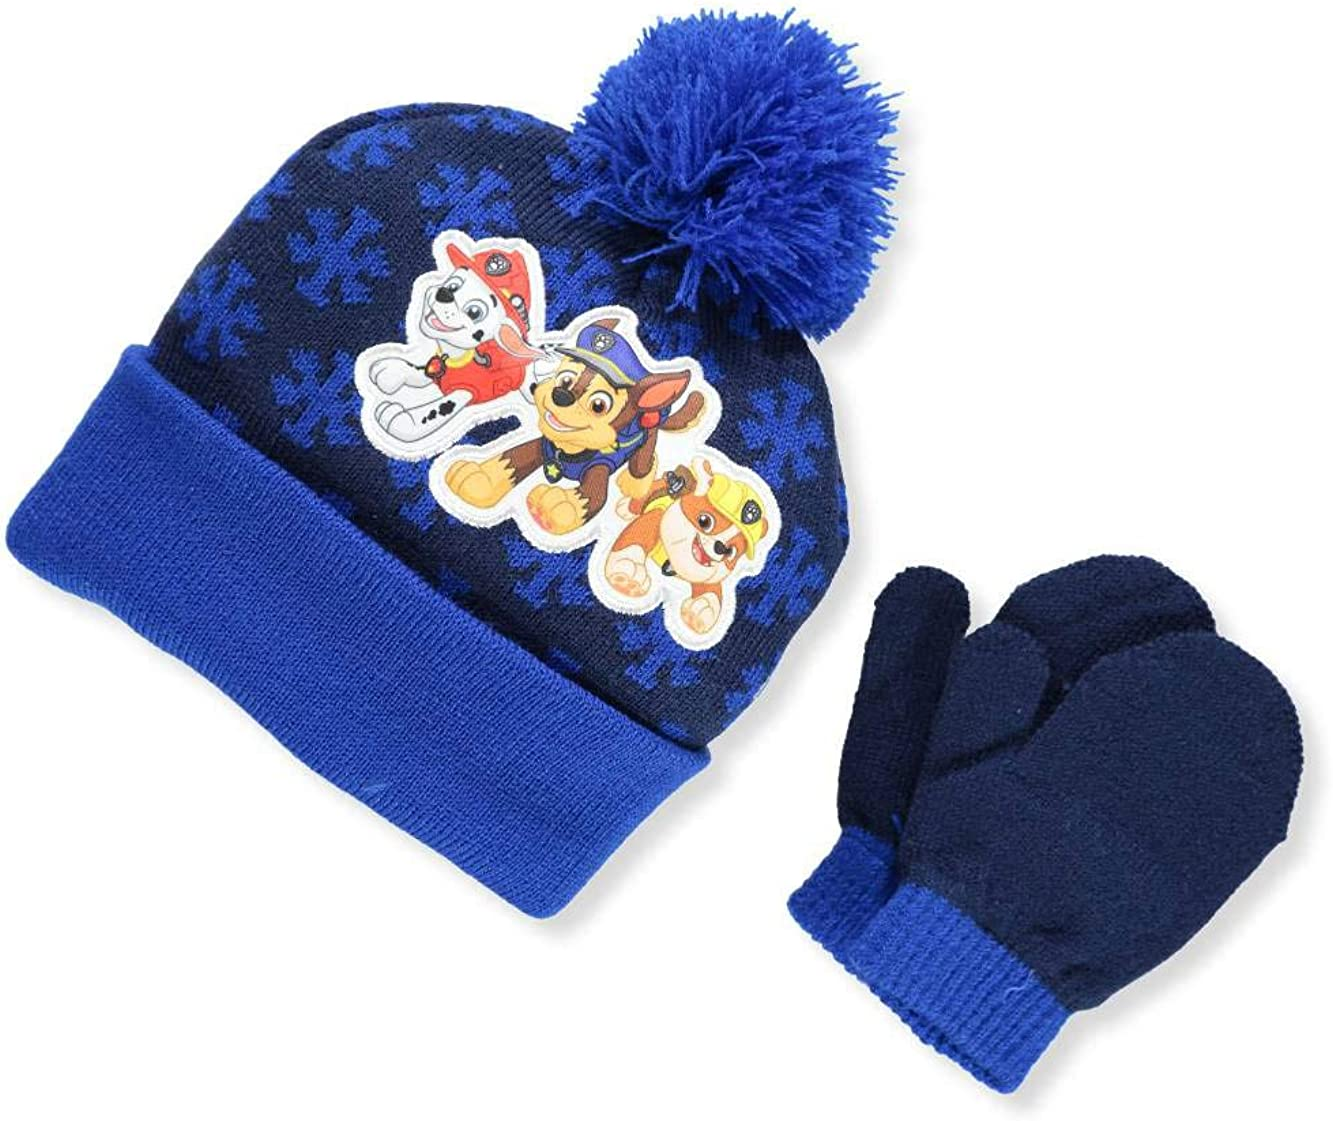 4015 Toddler Size Nick JR Paw Patrol Boys Beanie Winter Hat and Mitten Set